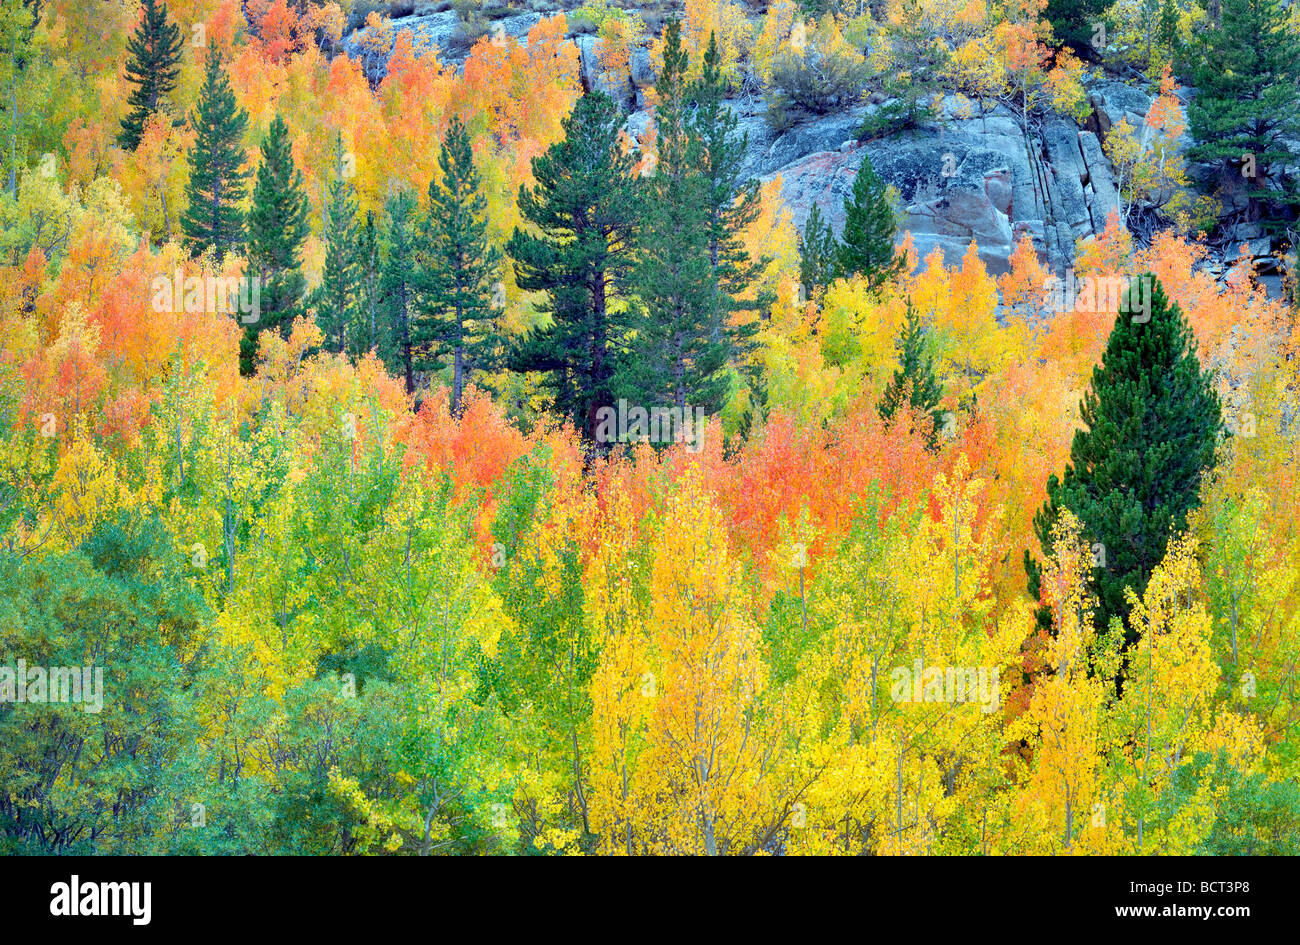 Bosque mixto de álamos en otoño colores y abetos Inyo National Forest, California Foto de stock